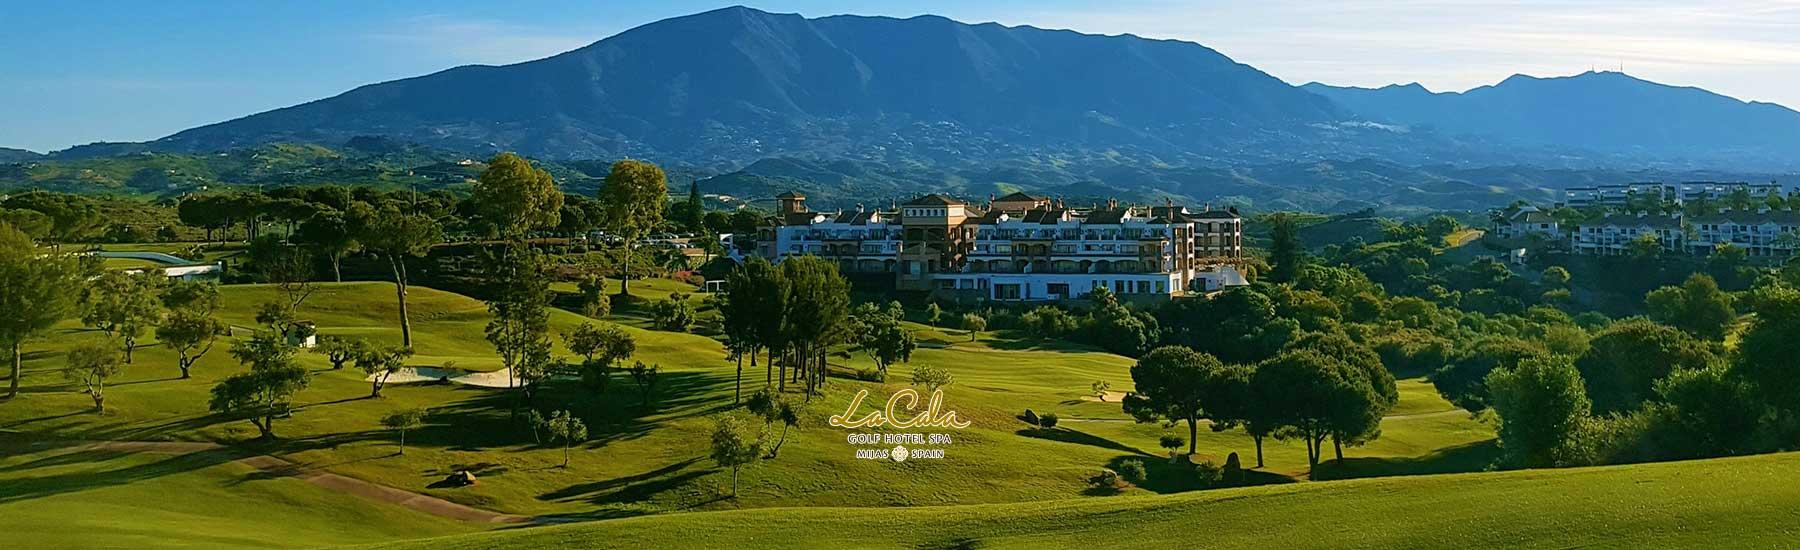 5 Reasons to Visit La Cala Resort in Spain